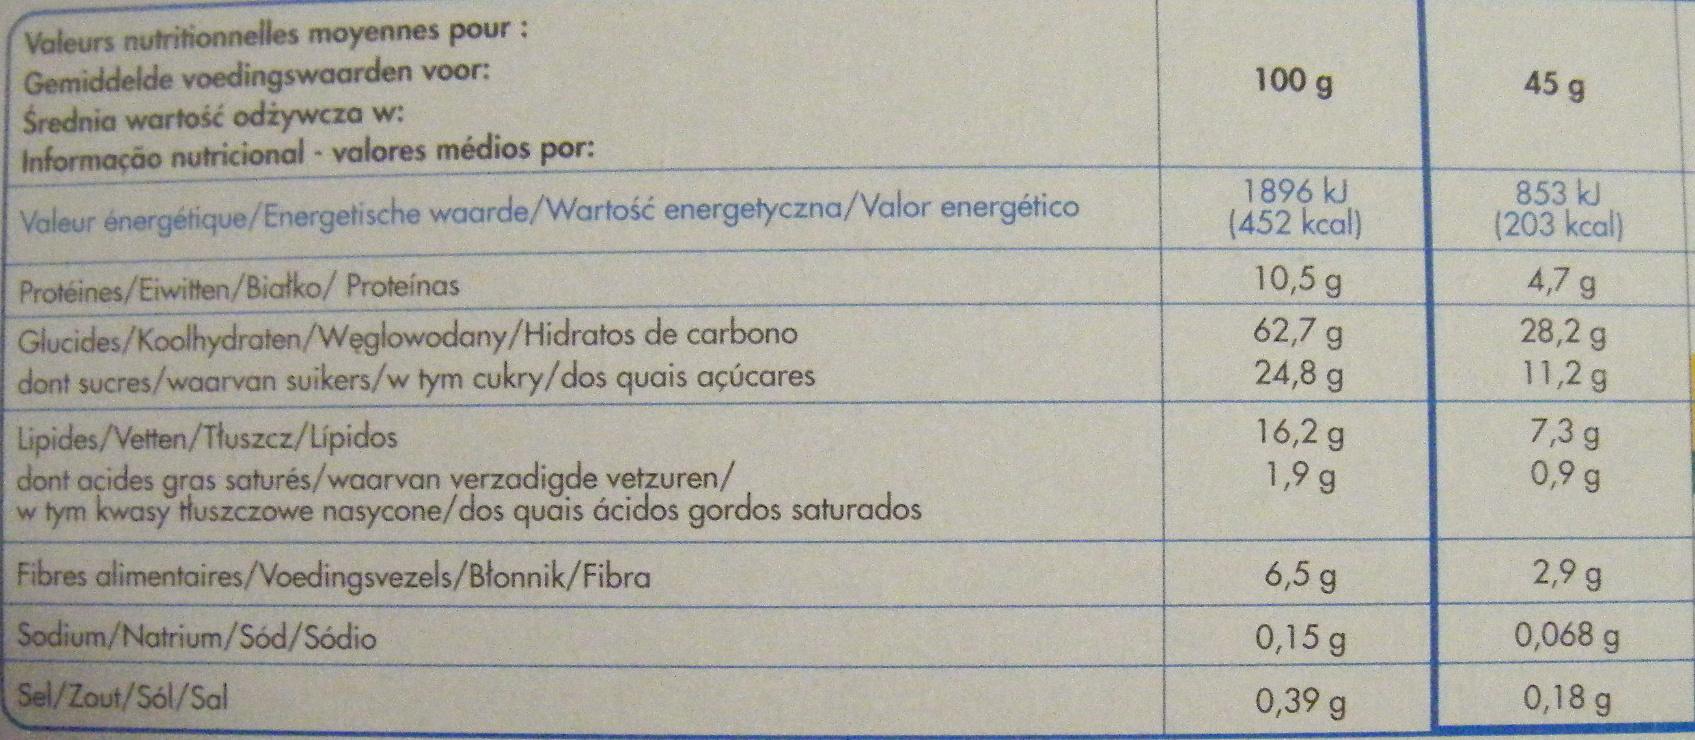 Muesli CRISP Fruits rouges Amandes grillées - Informations nutritionnelles - fr